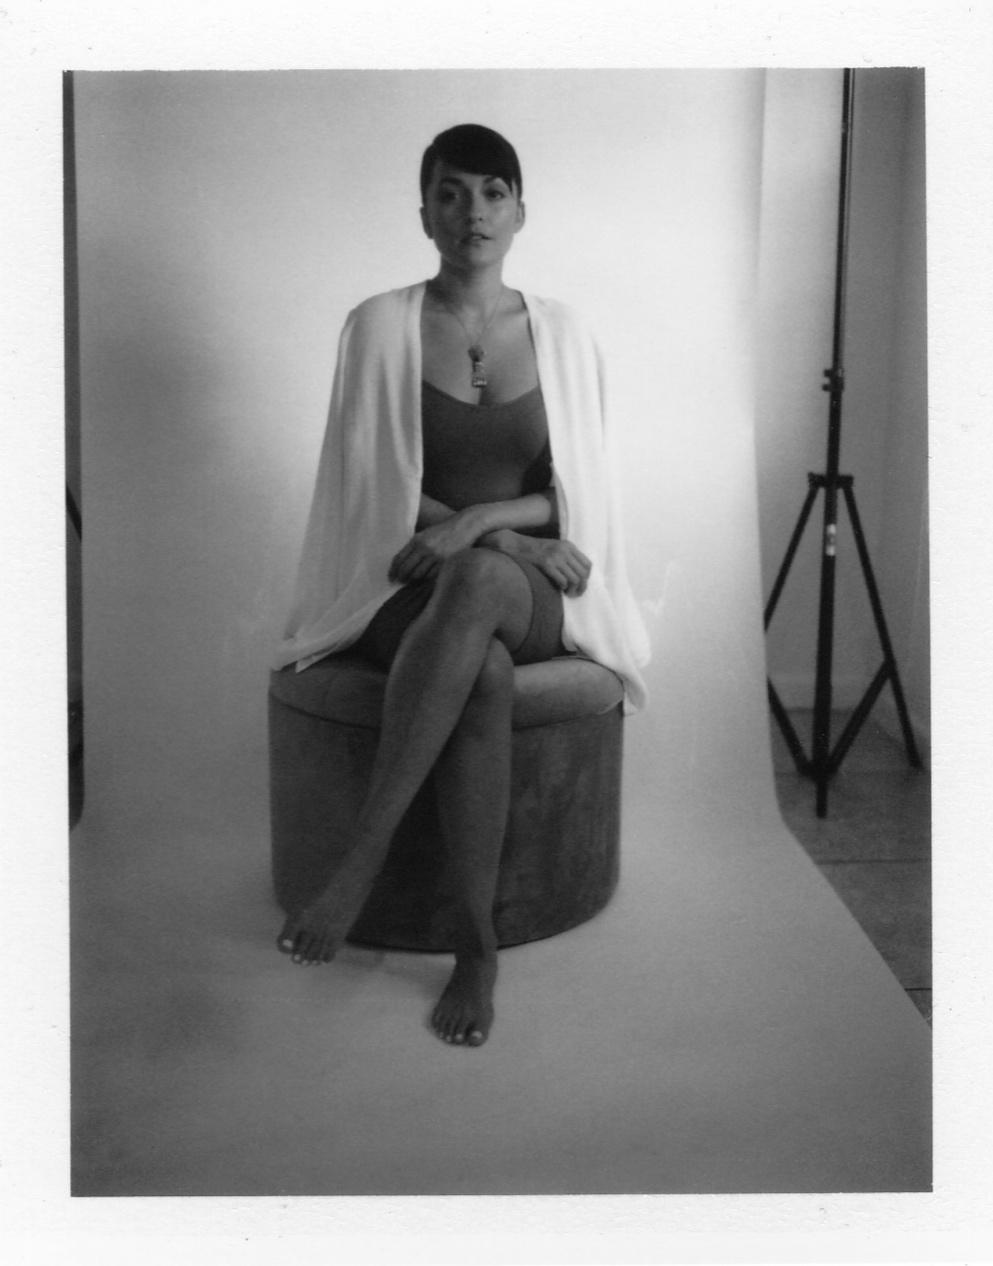 Film+Palm+Beach+Studio+Photographer+Modern+Portraits+Studio+Photographer+Fujifilm+FP3000b.jpg